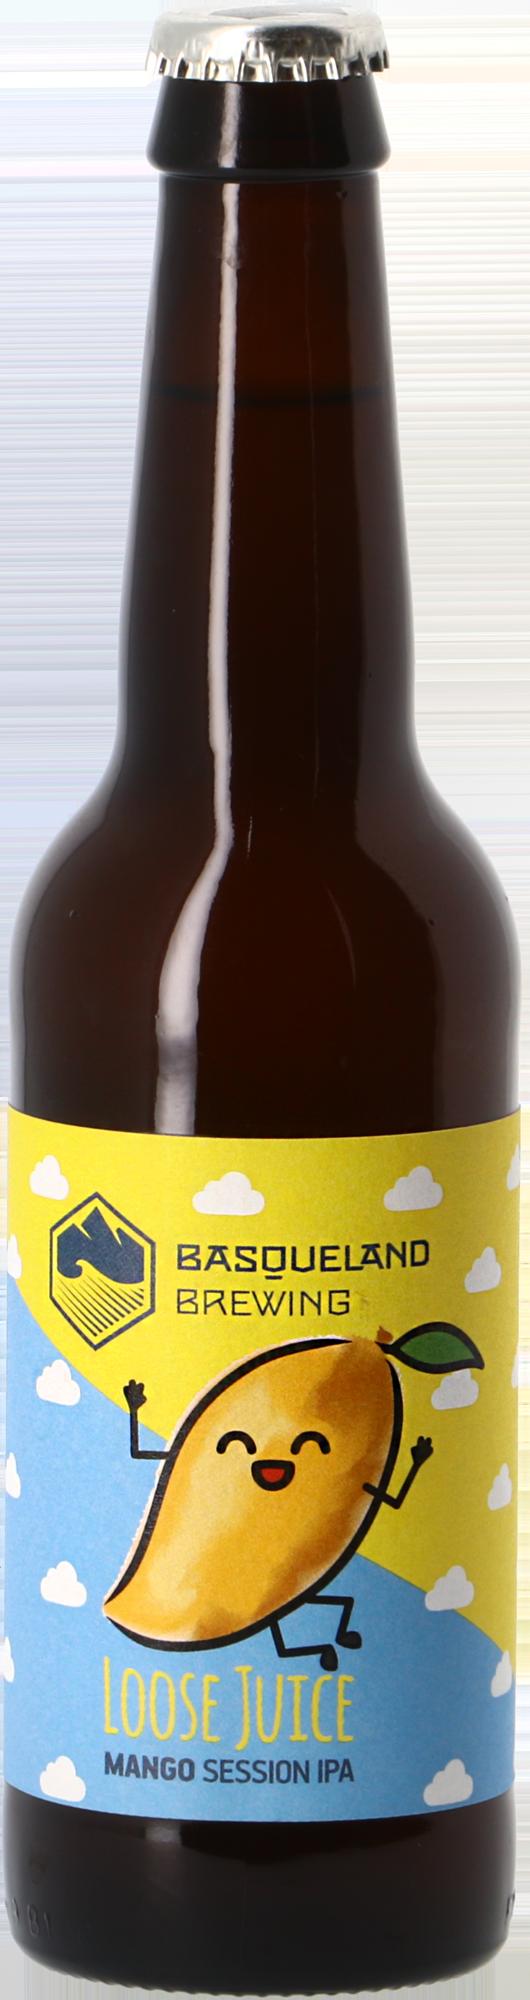 Basqueland Loose Juice